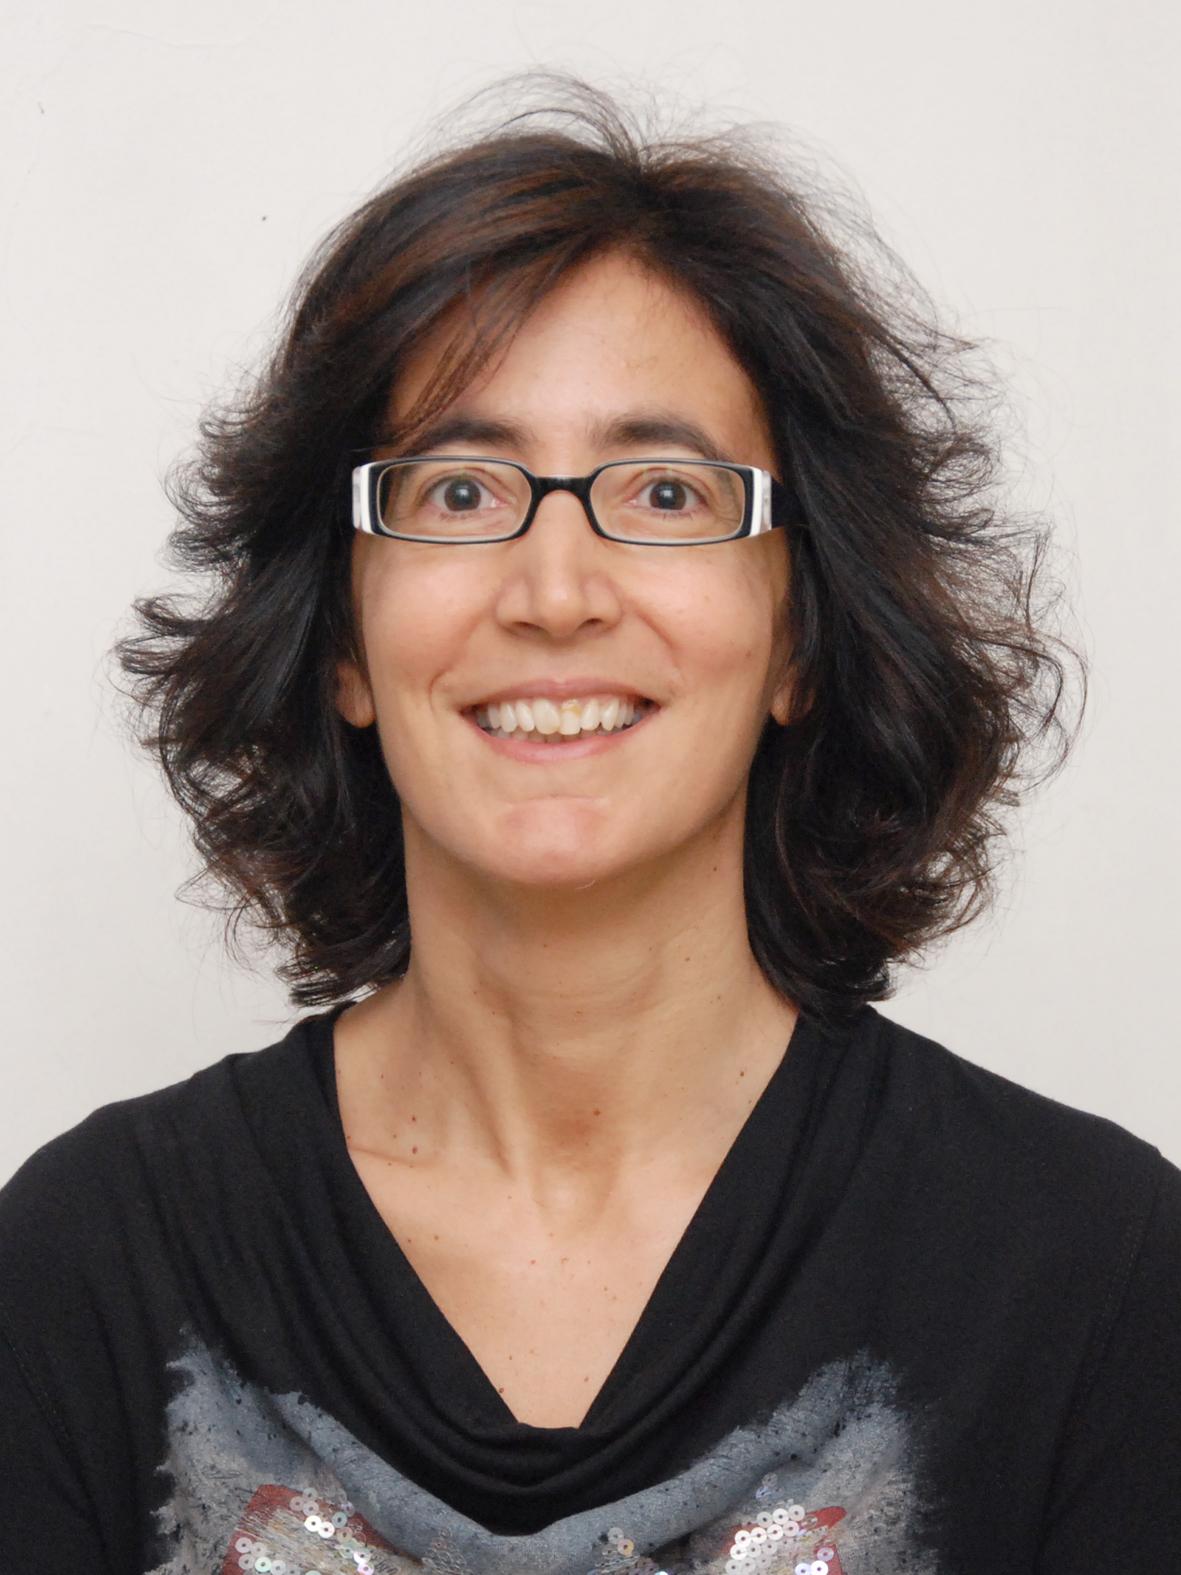 Roberta Dessi